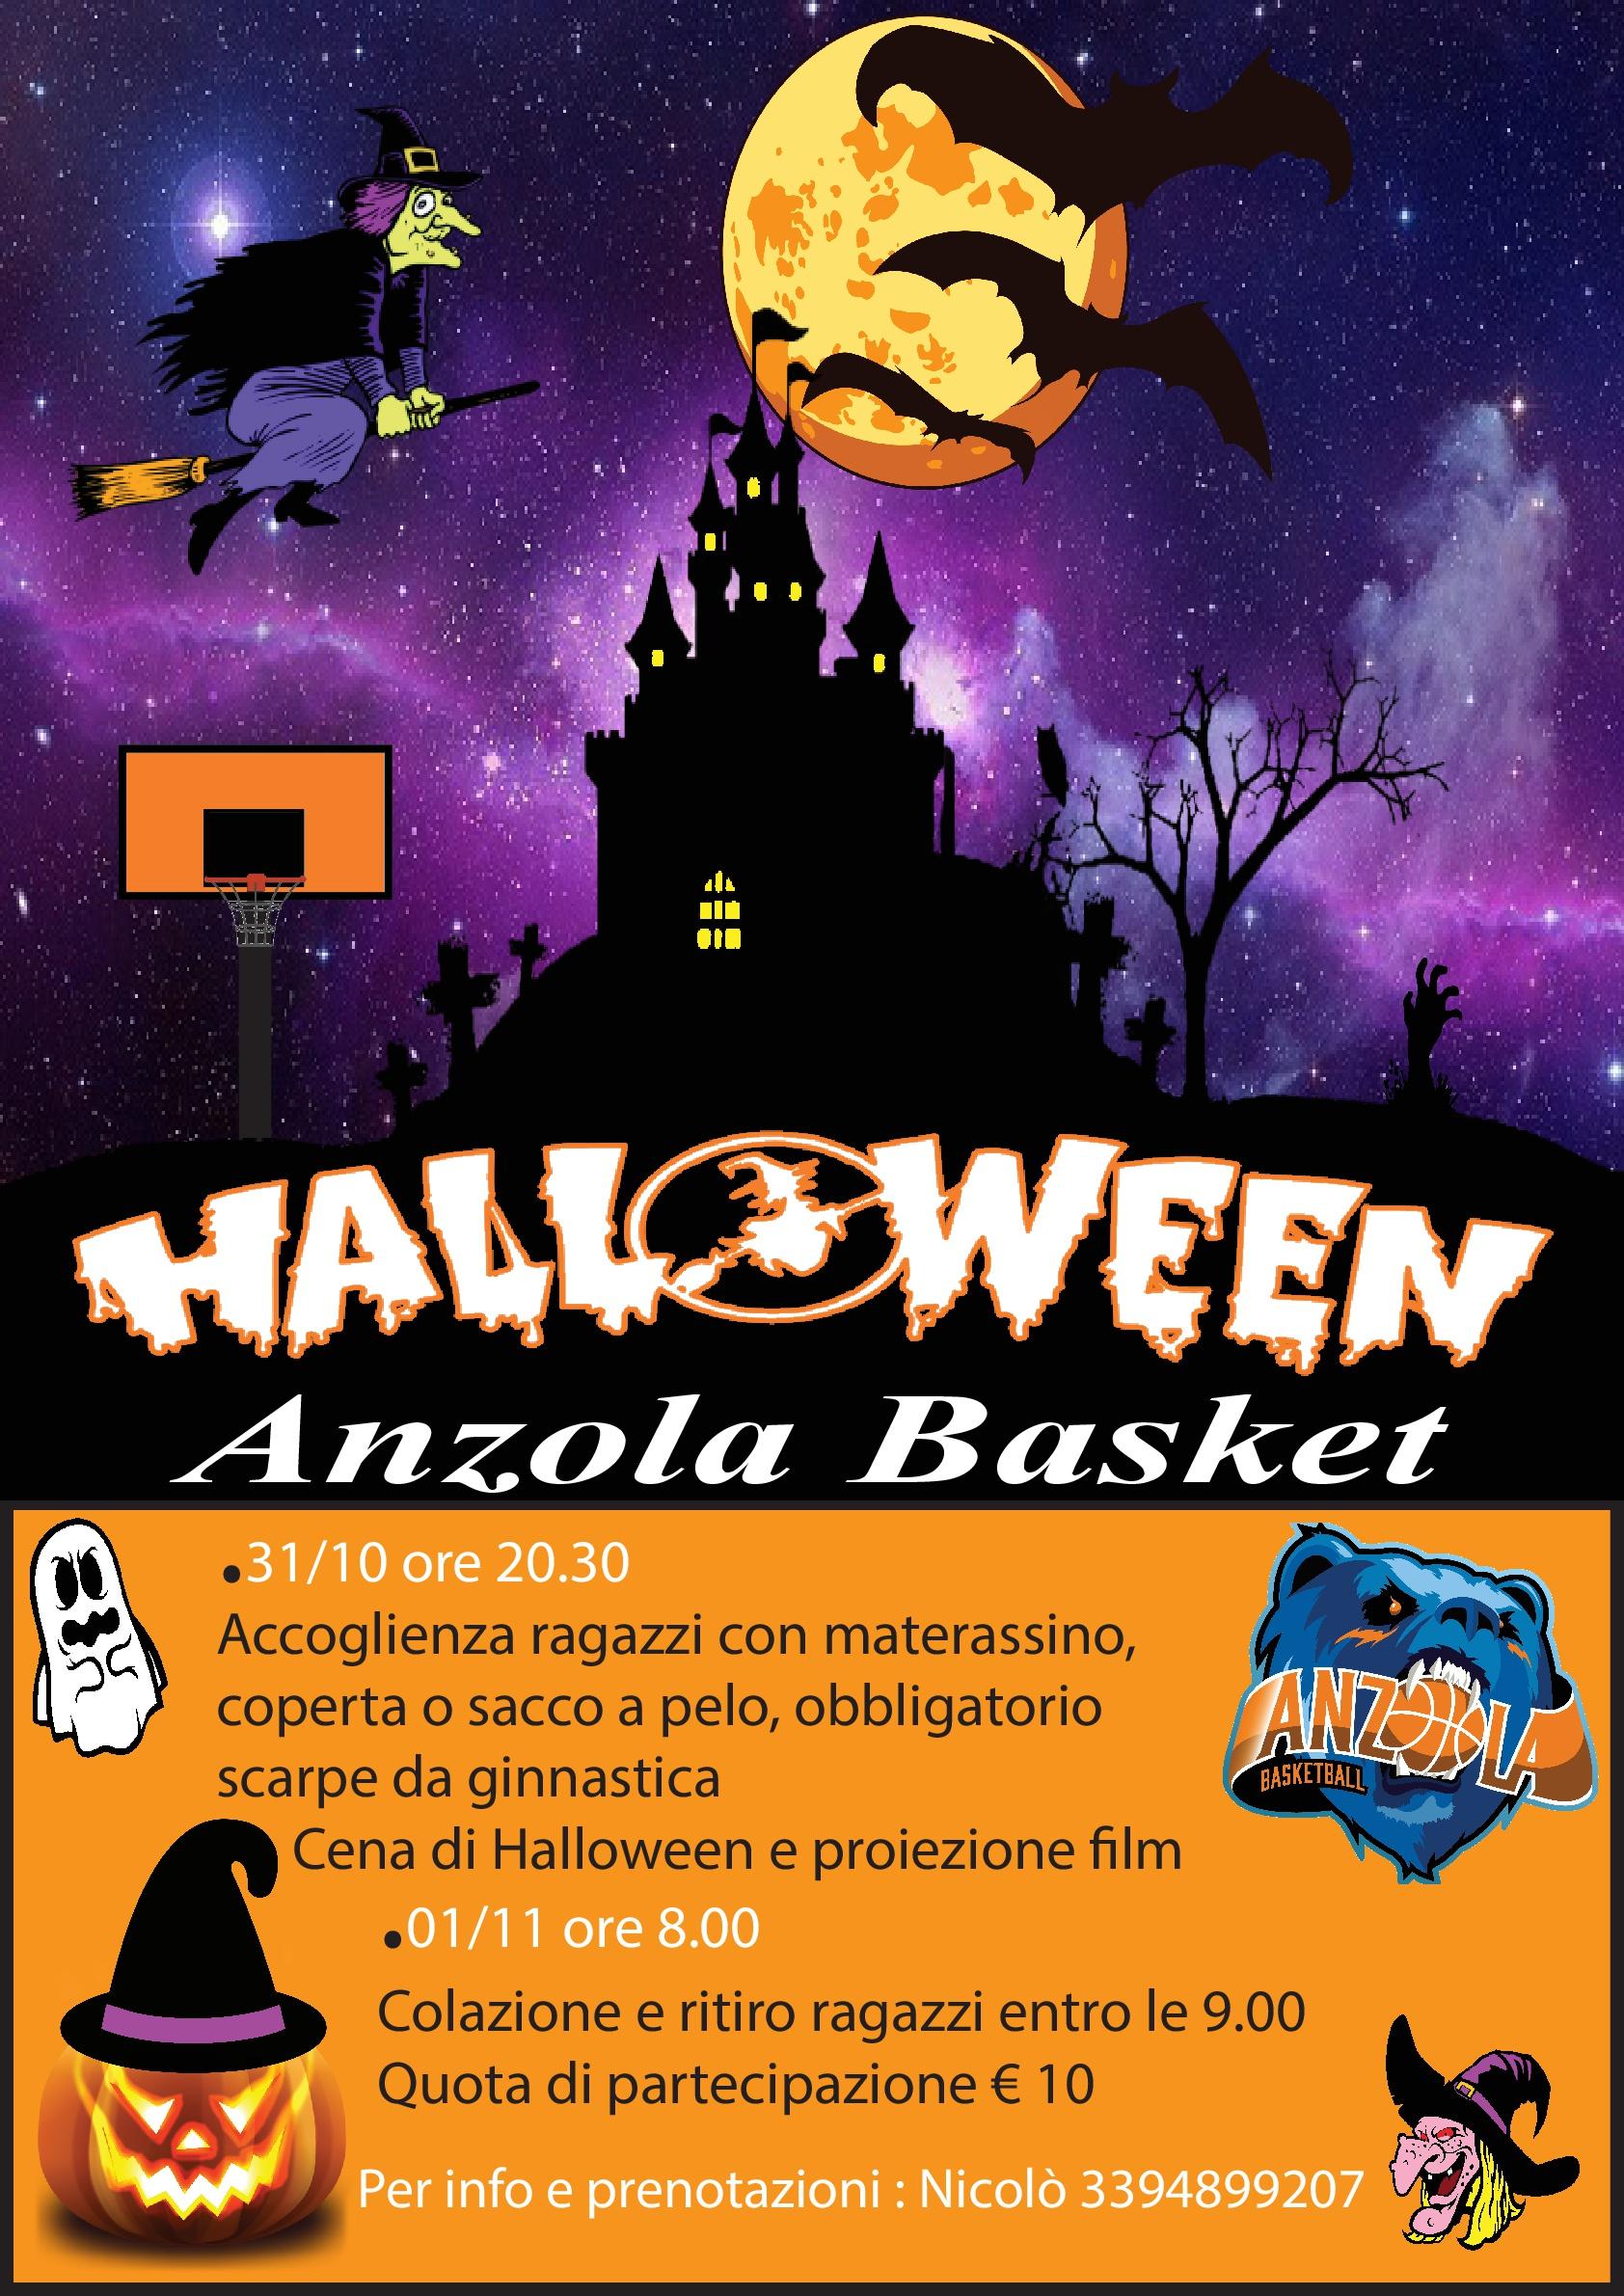 Film Di Halloween Per Bambini.Notte Di Halloween Anzola Basket